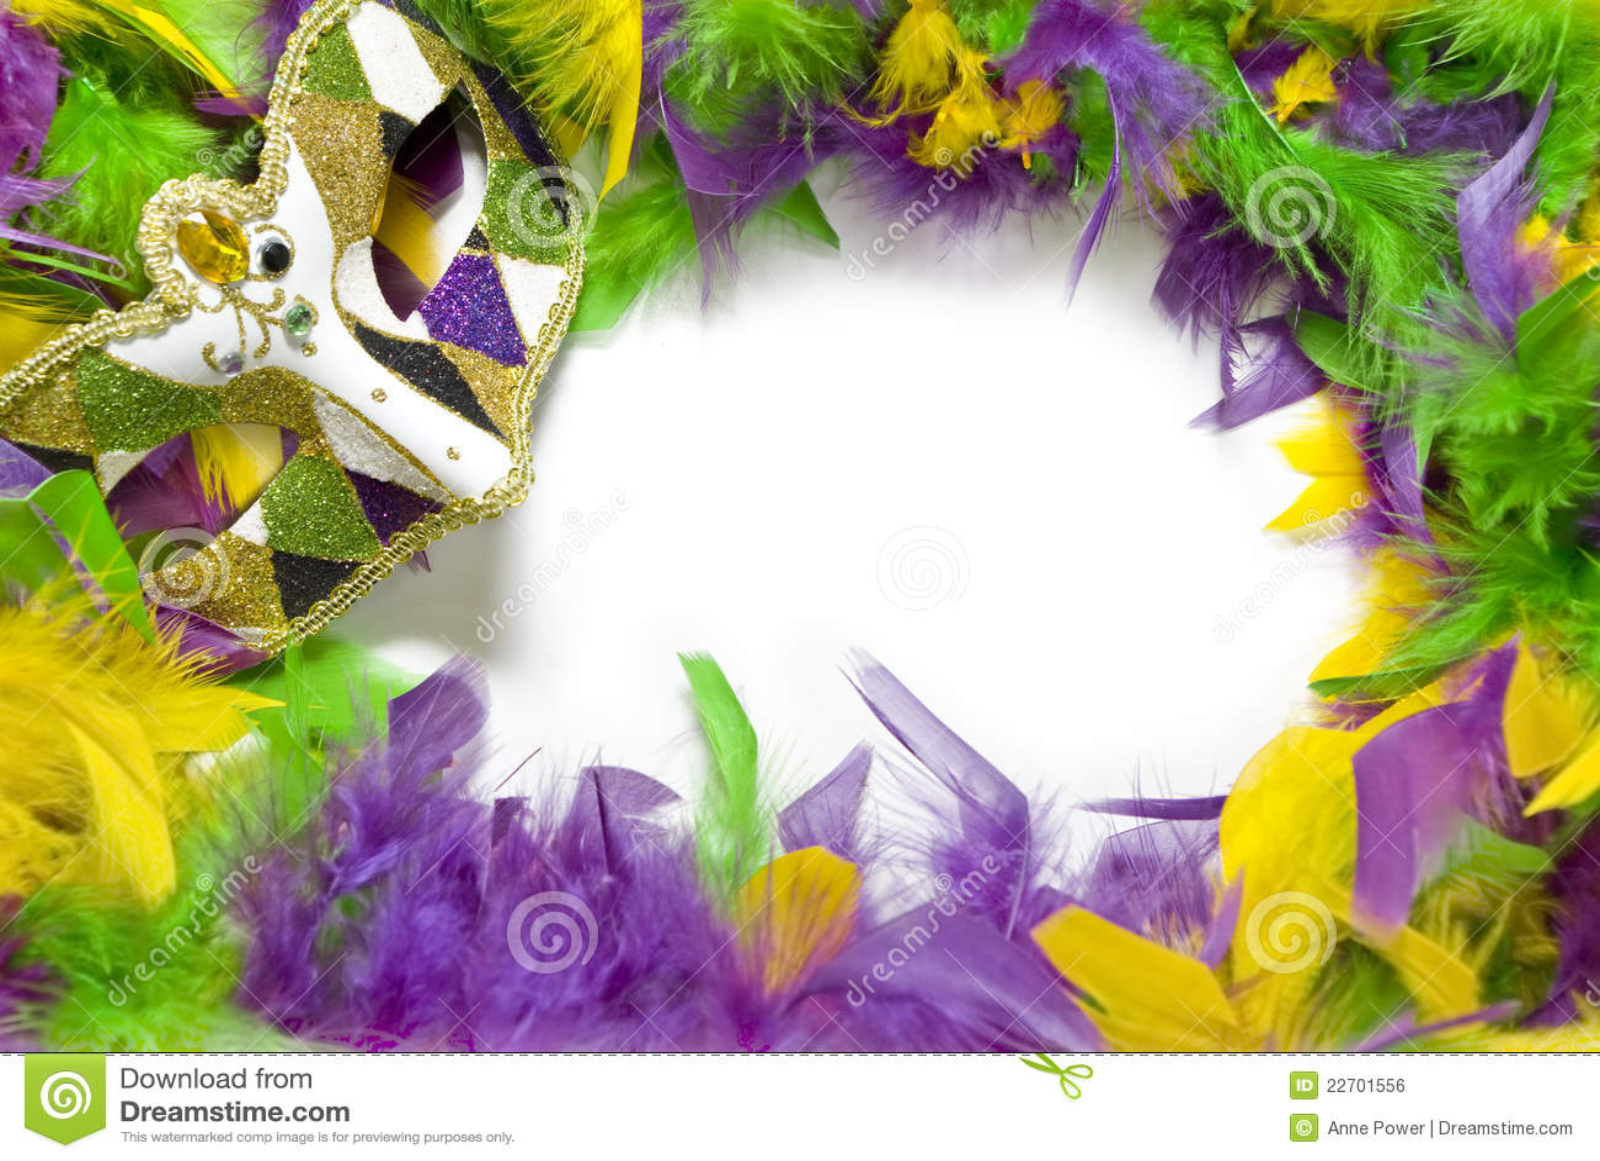 Mardi Gras Feather & Mask Frame Royalty Free Stock Image - Image: 22701556